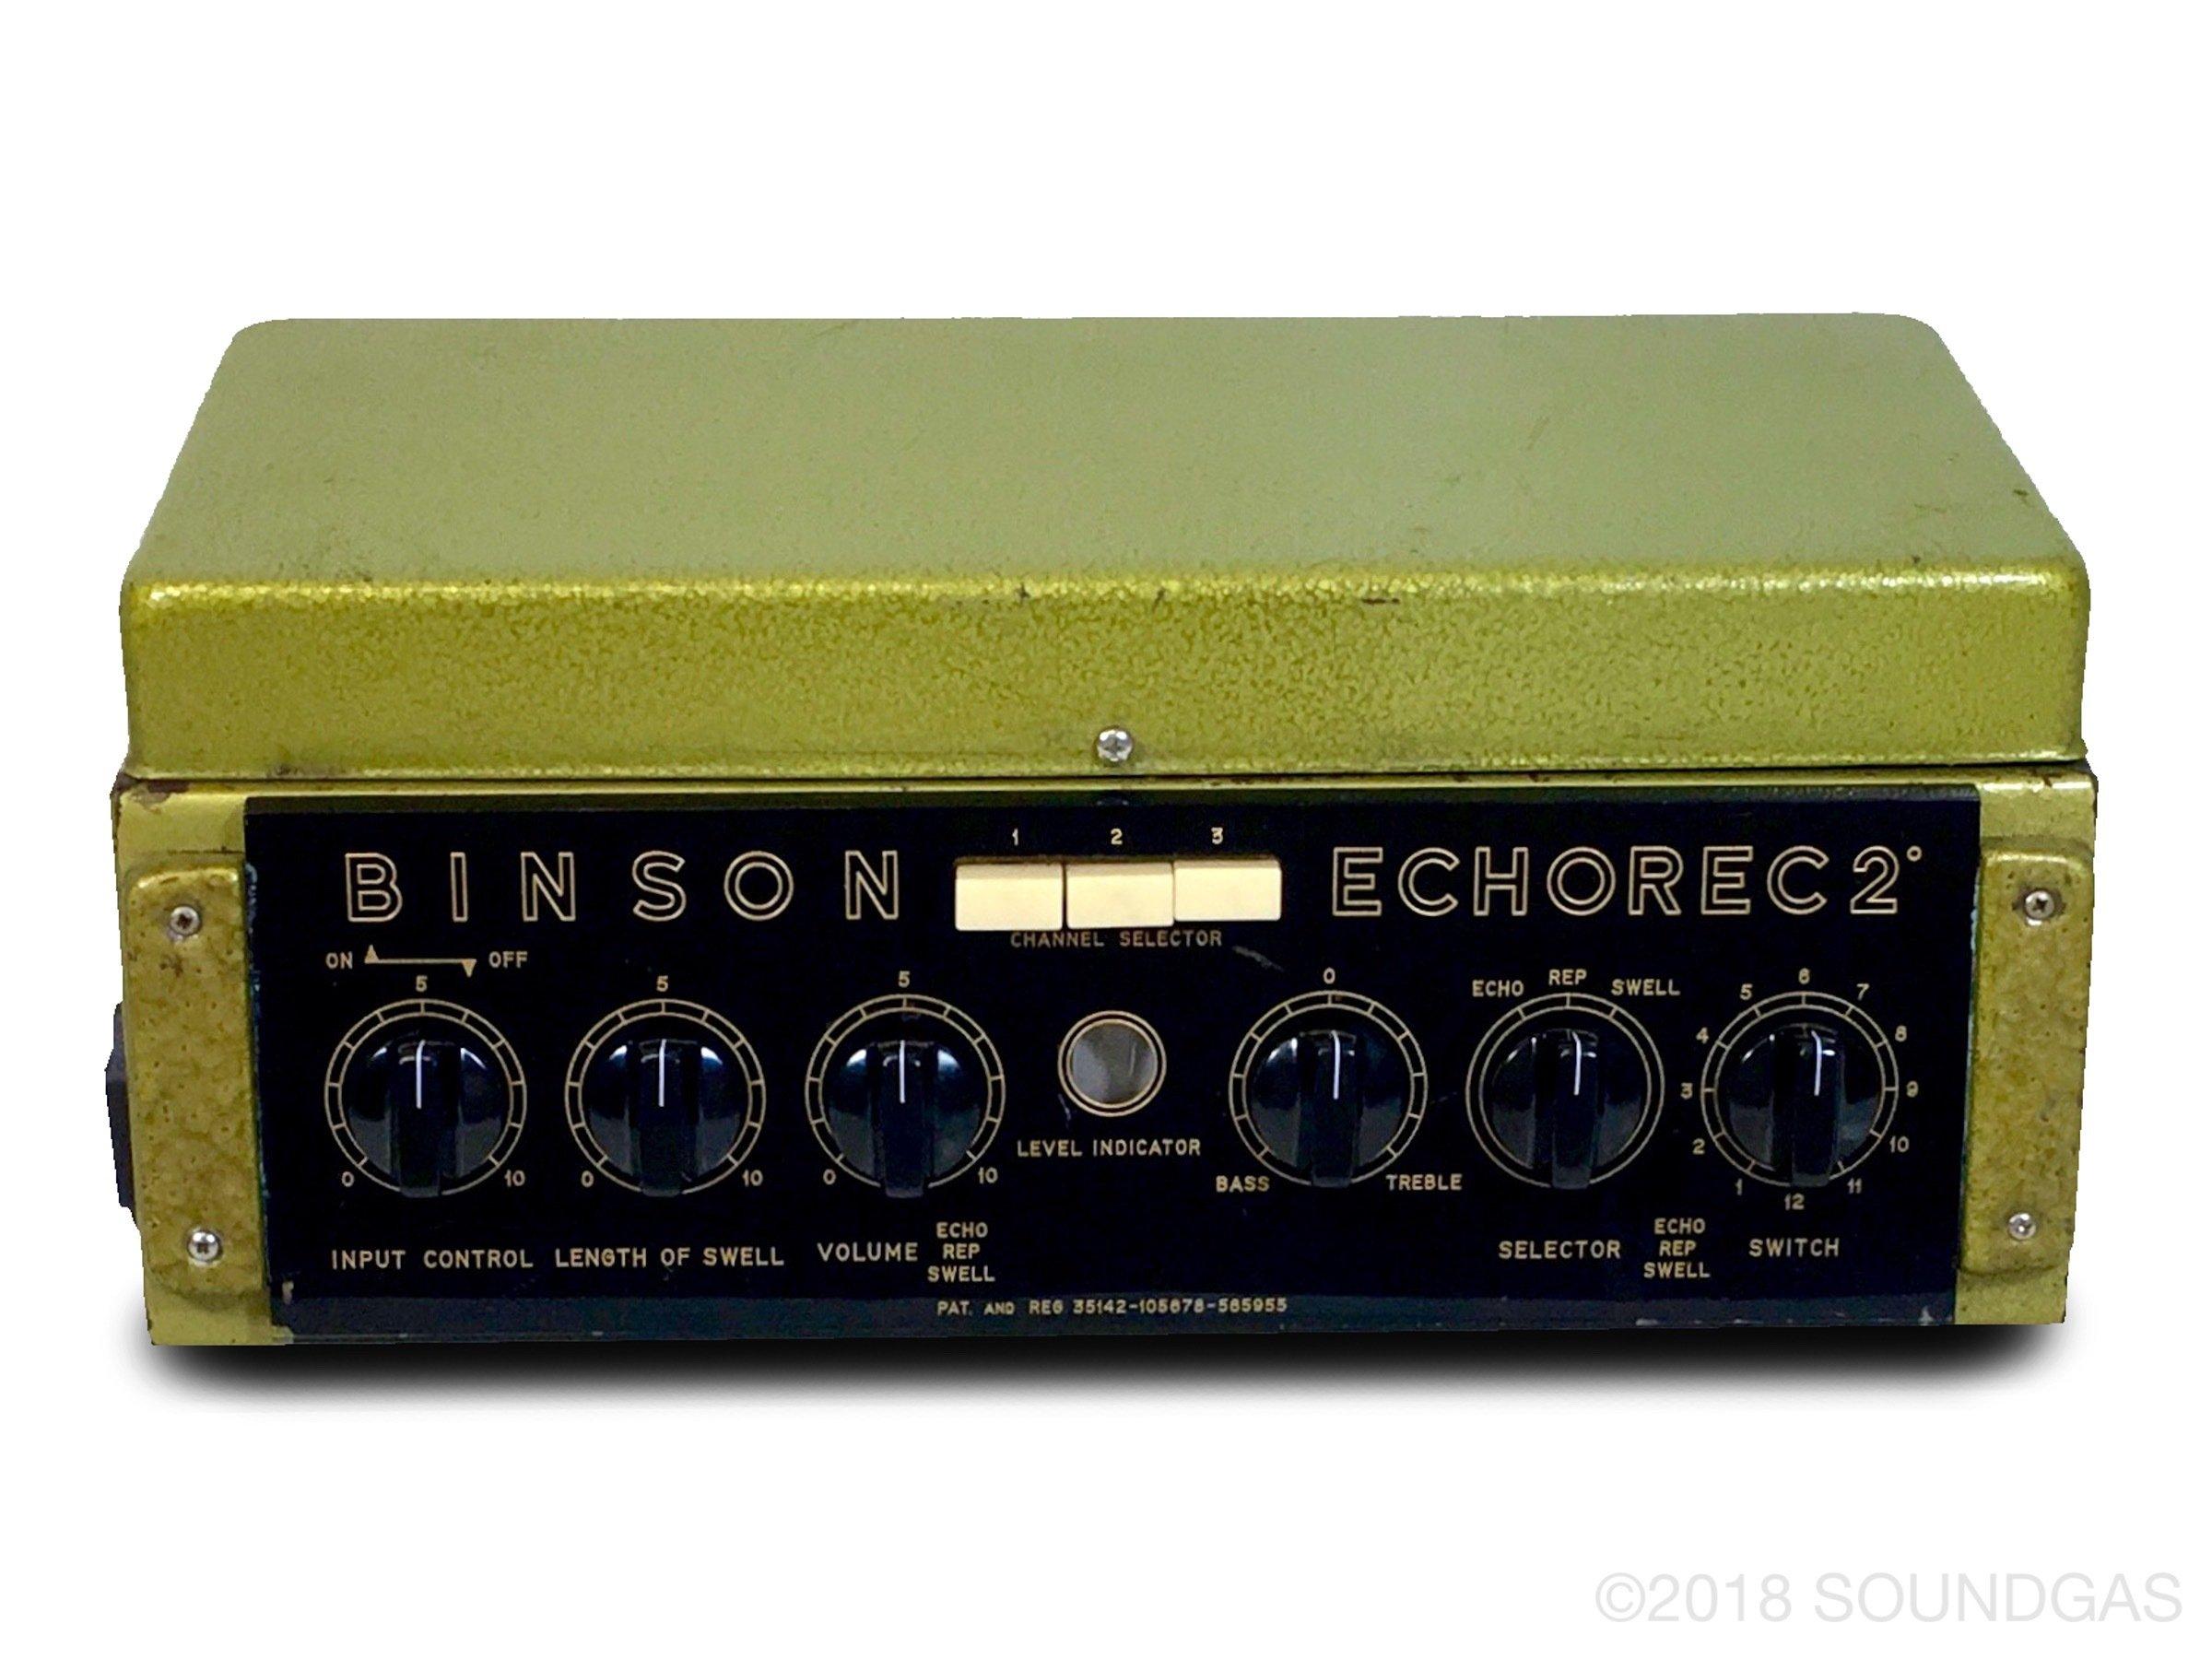 Binson Echorec 2º T7E